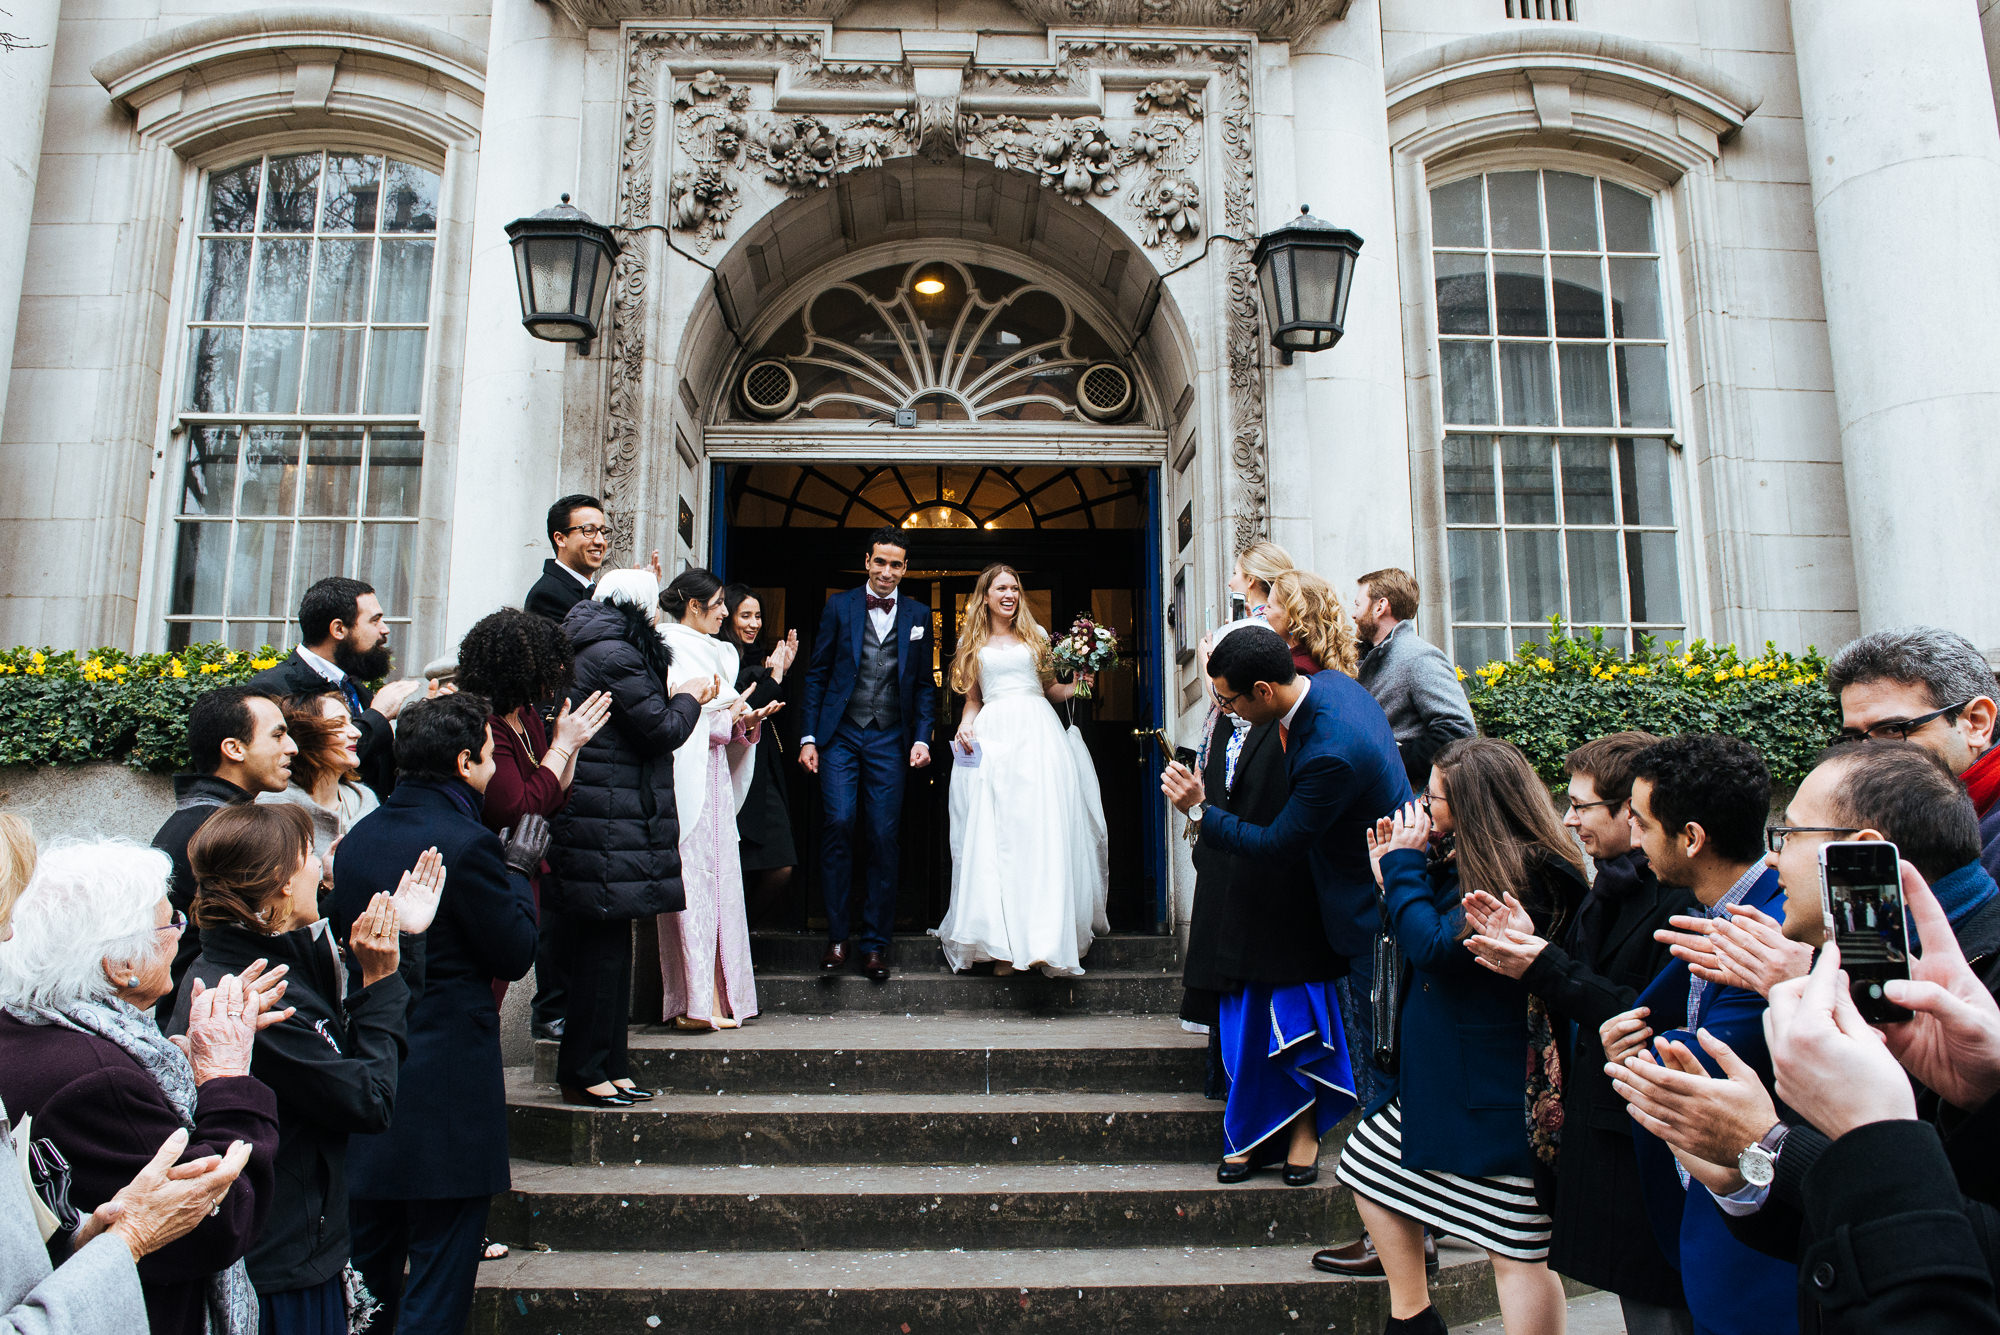 Southbridge town hall wedding